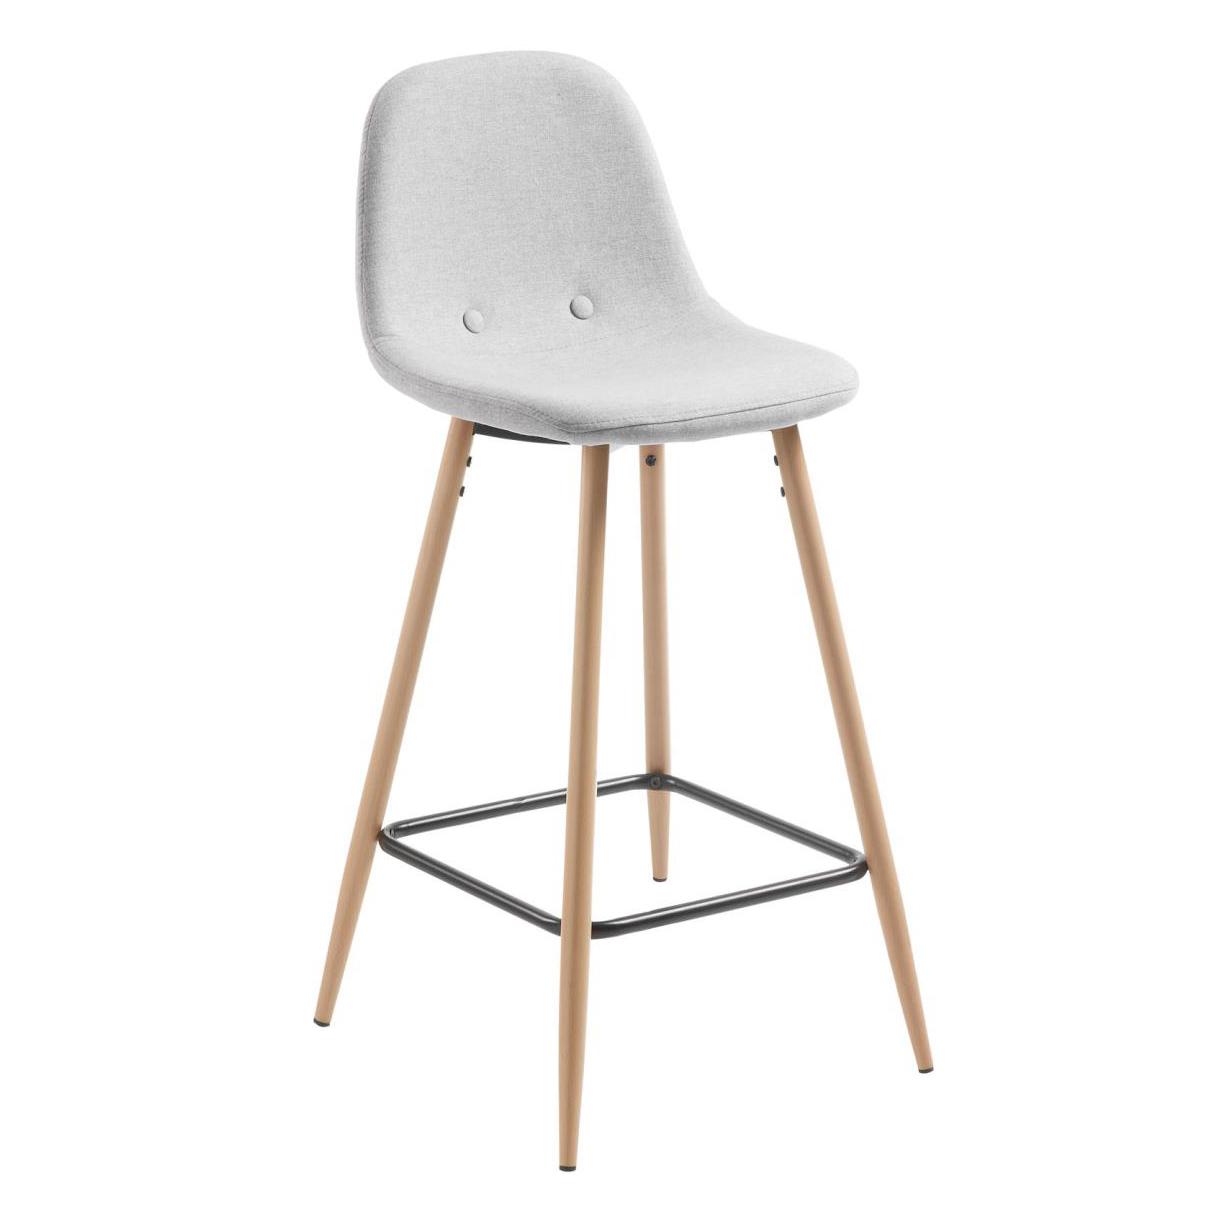 Cadeira de bar Nolita, estofada, cinza